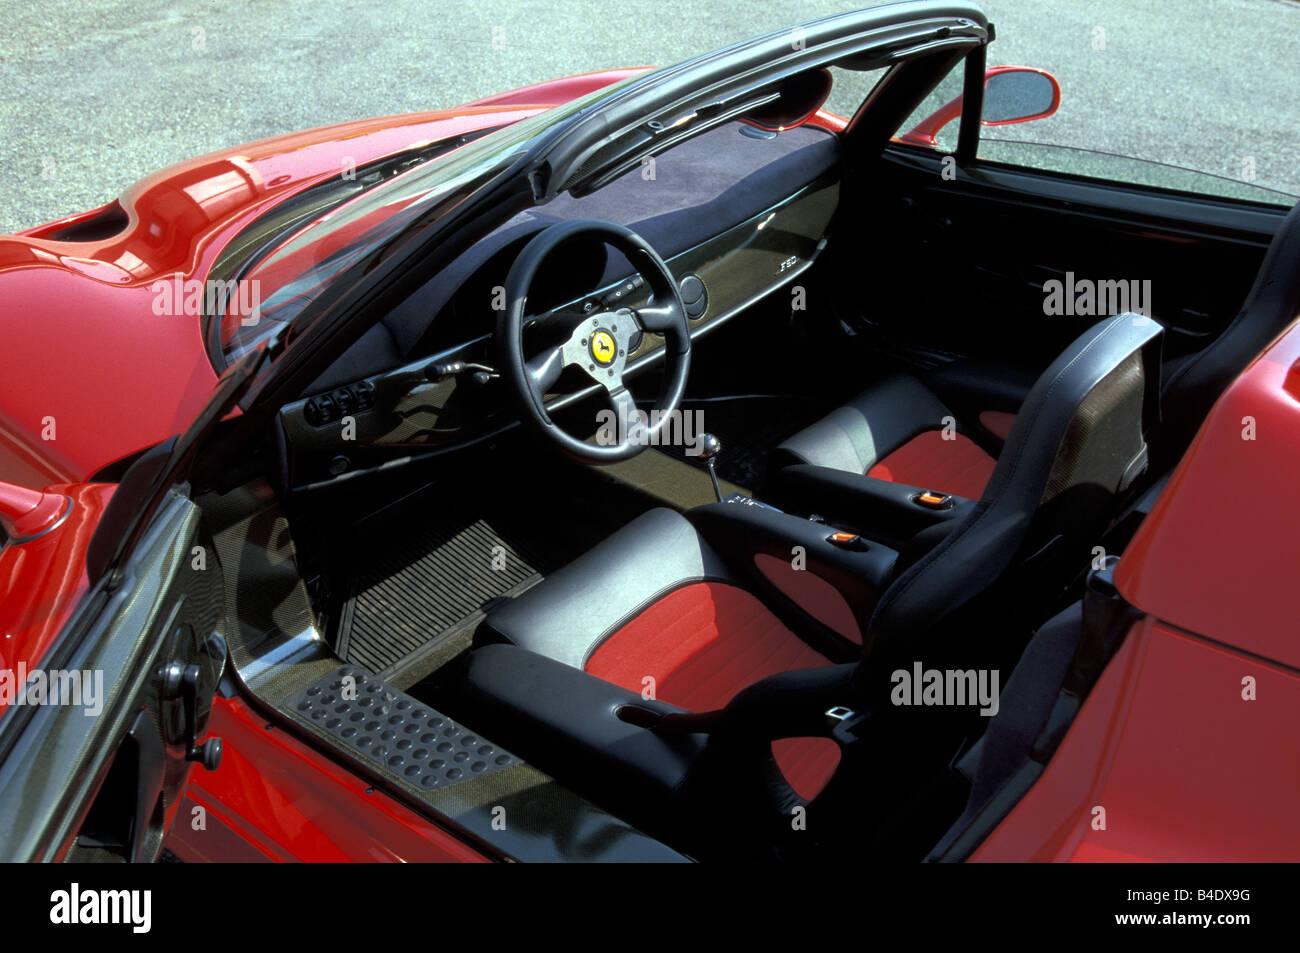 Ferrari f50 interior gallery hd cars wallpaper car ferrari f50 model year 1995 2002 red roadster convertible car ferrari f50 model year 1995 vanachro Choice Image